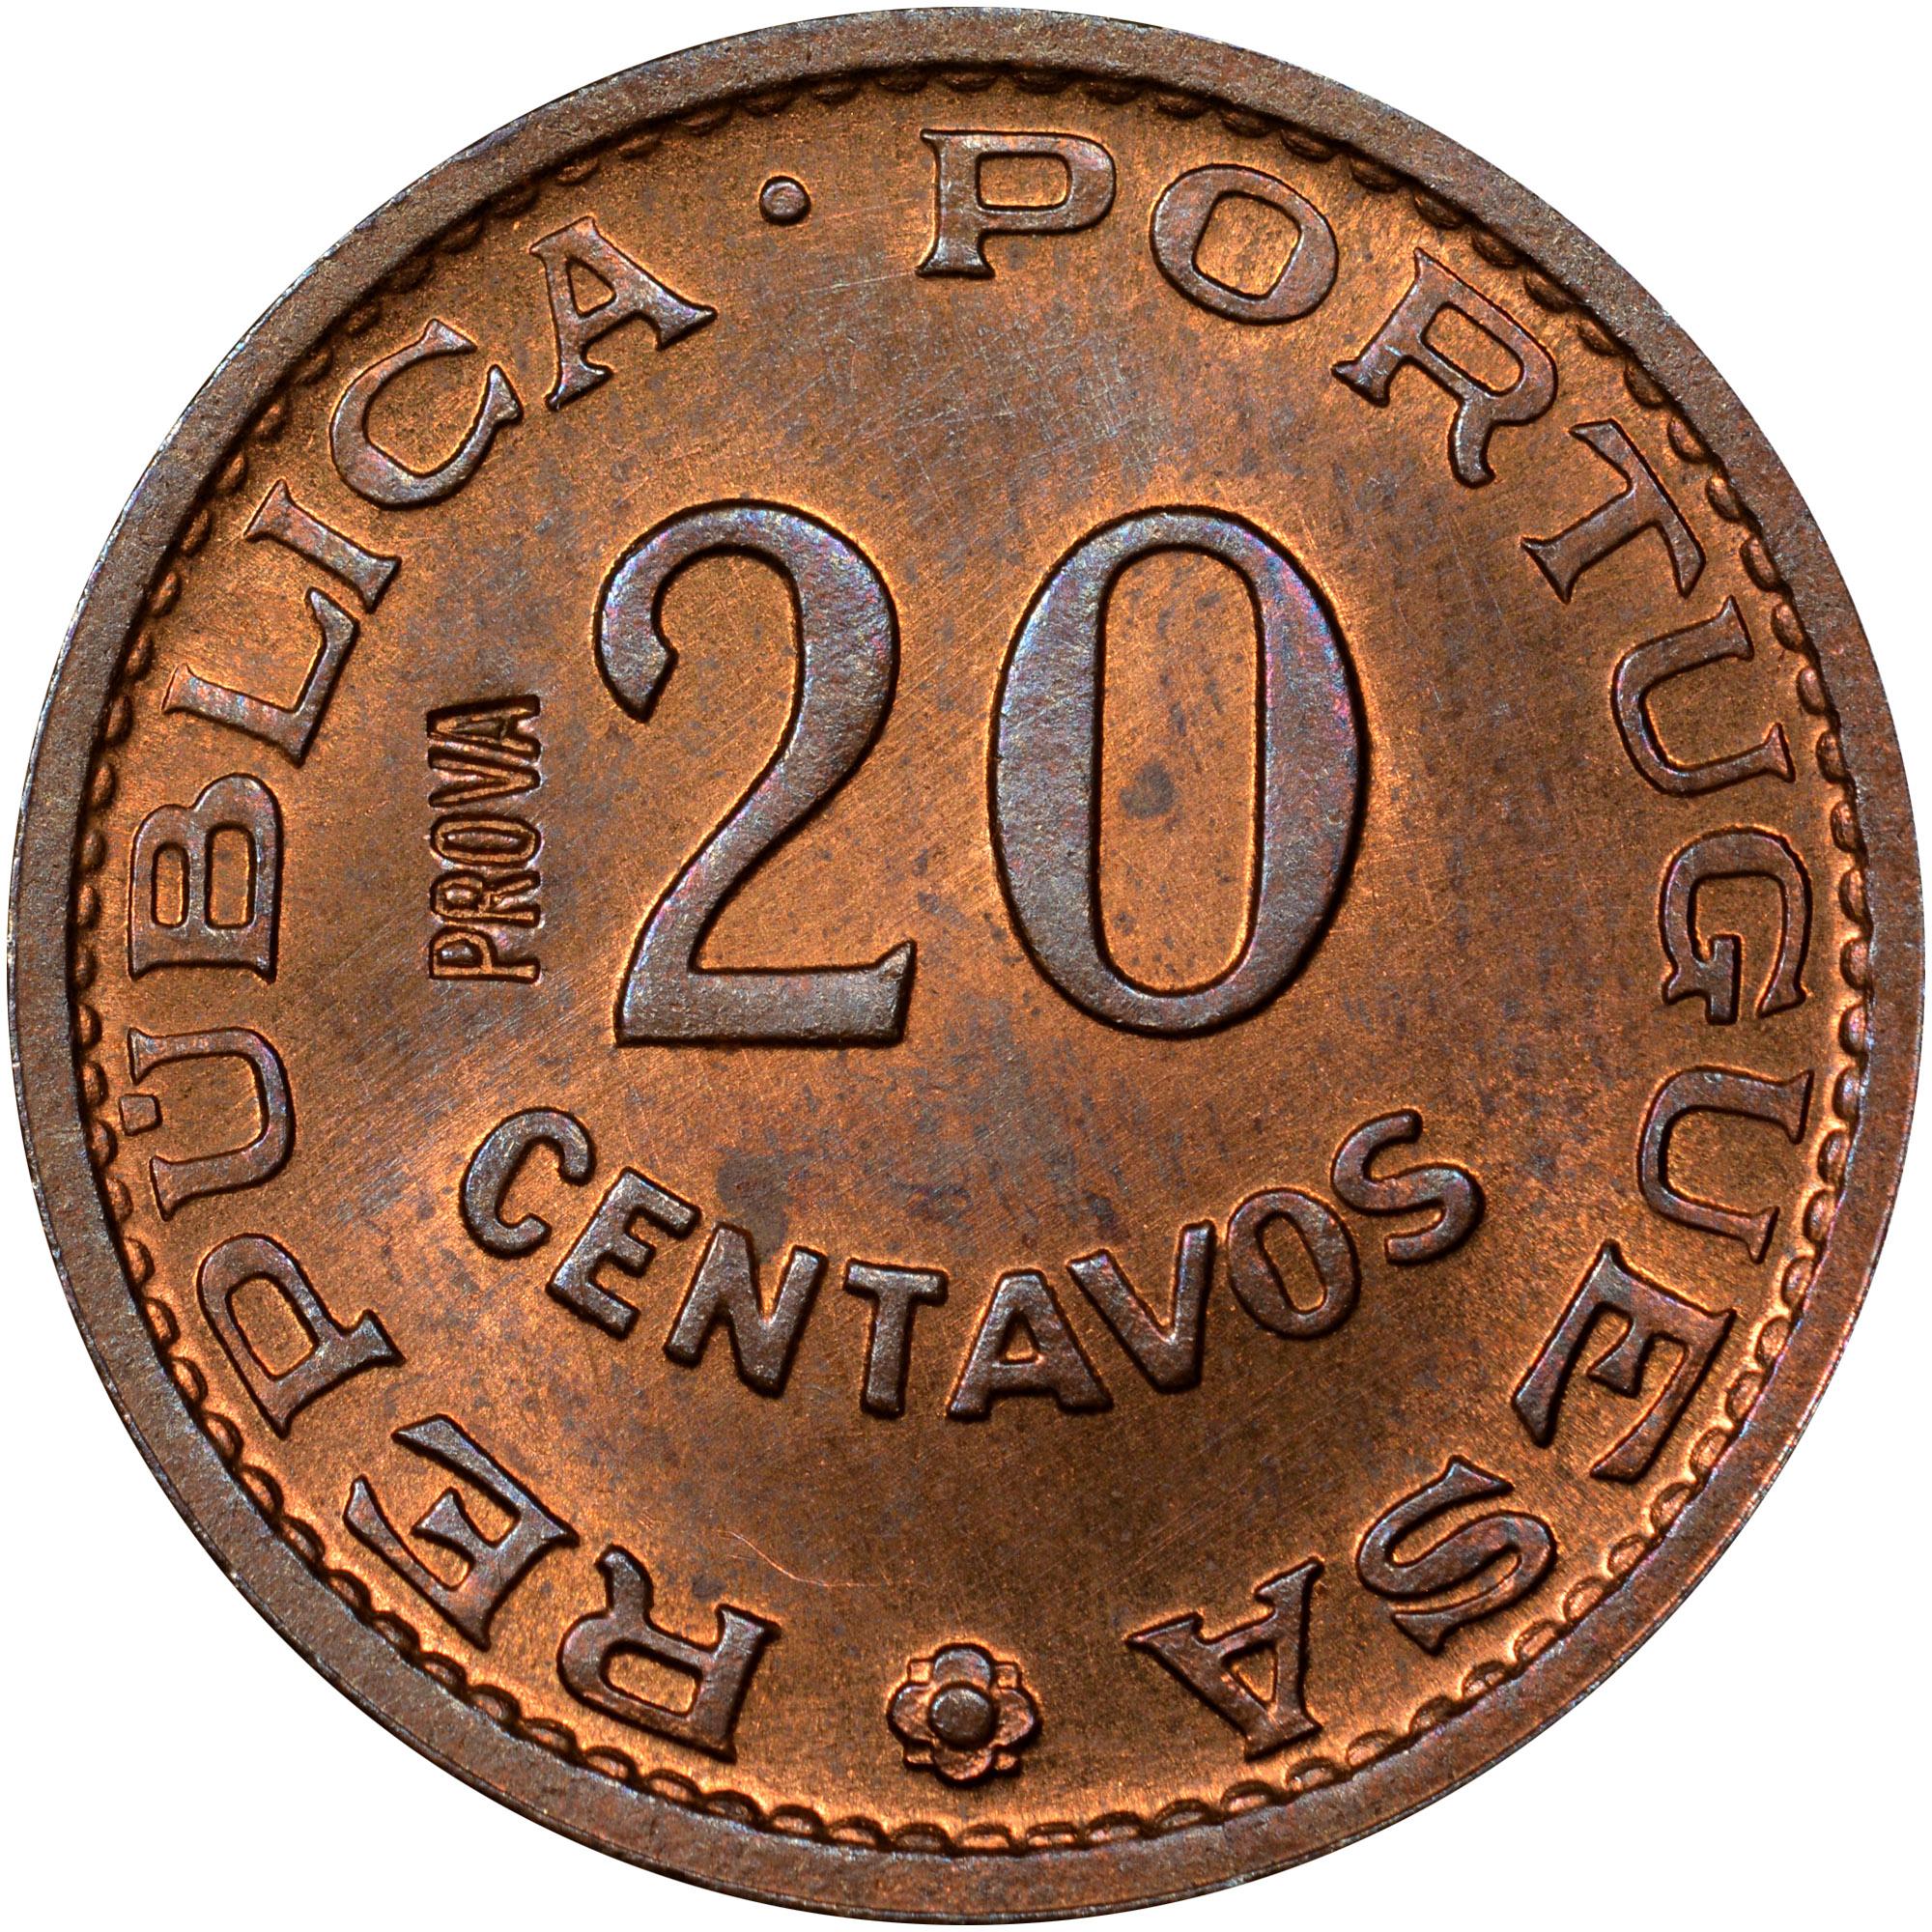 1962 Angola 20 Centavos obverse